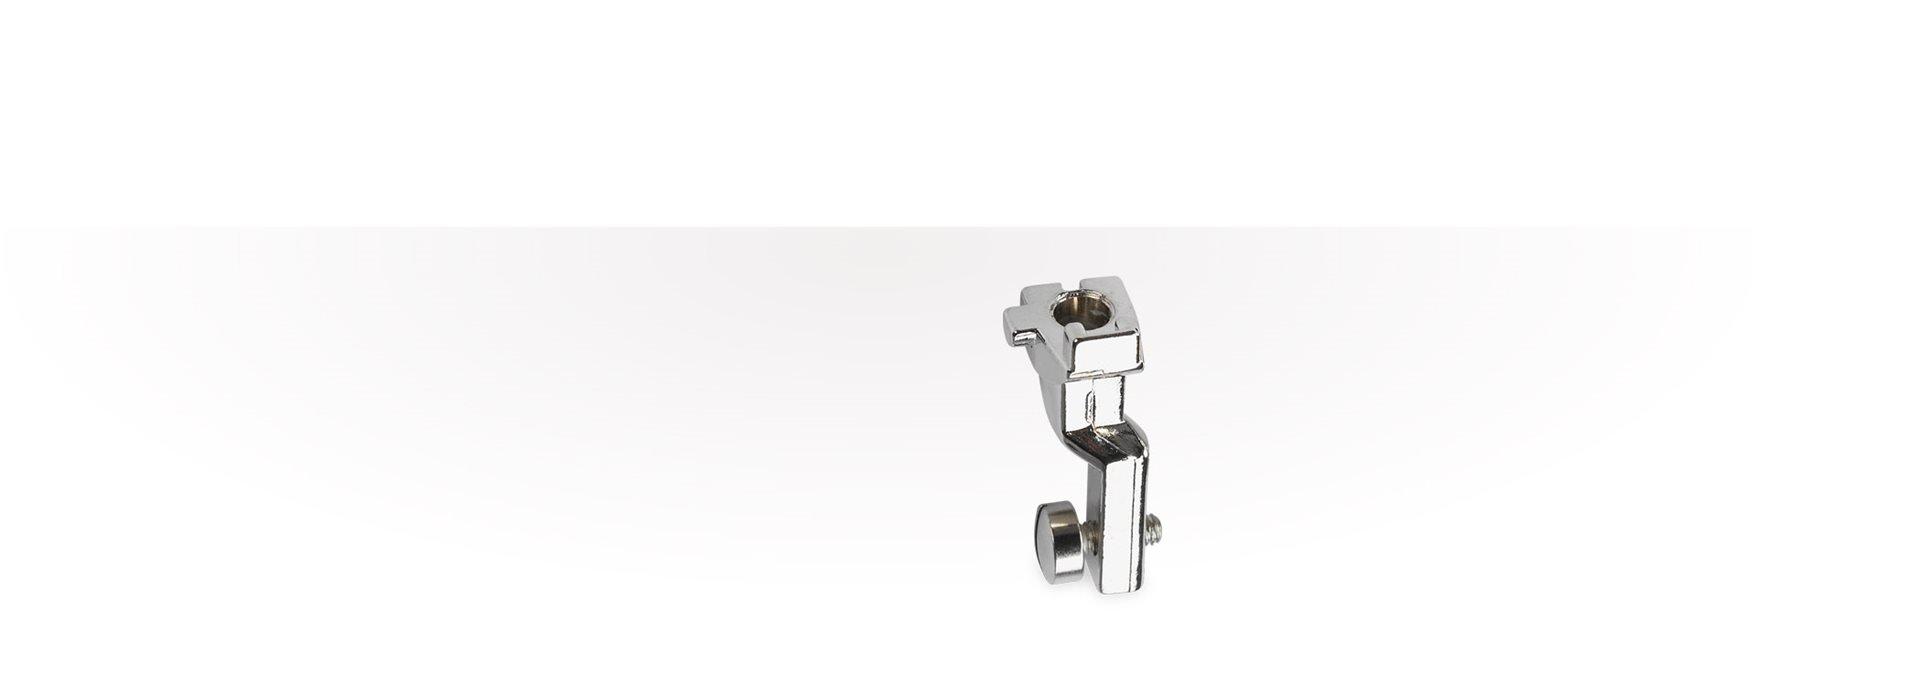 Foot #75 - Standard Adapter (Low Shank)